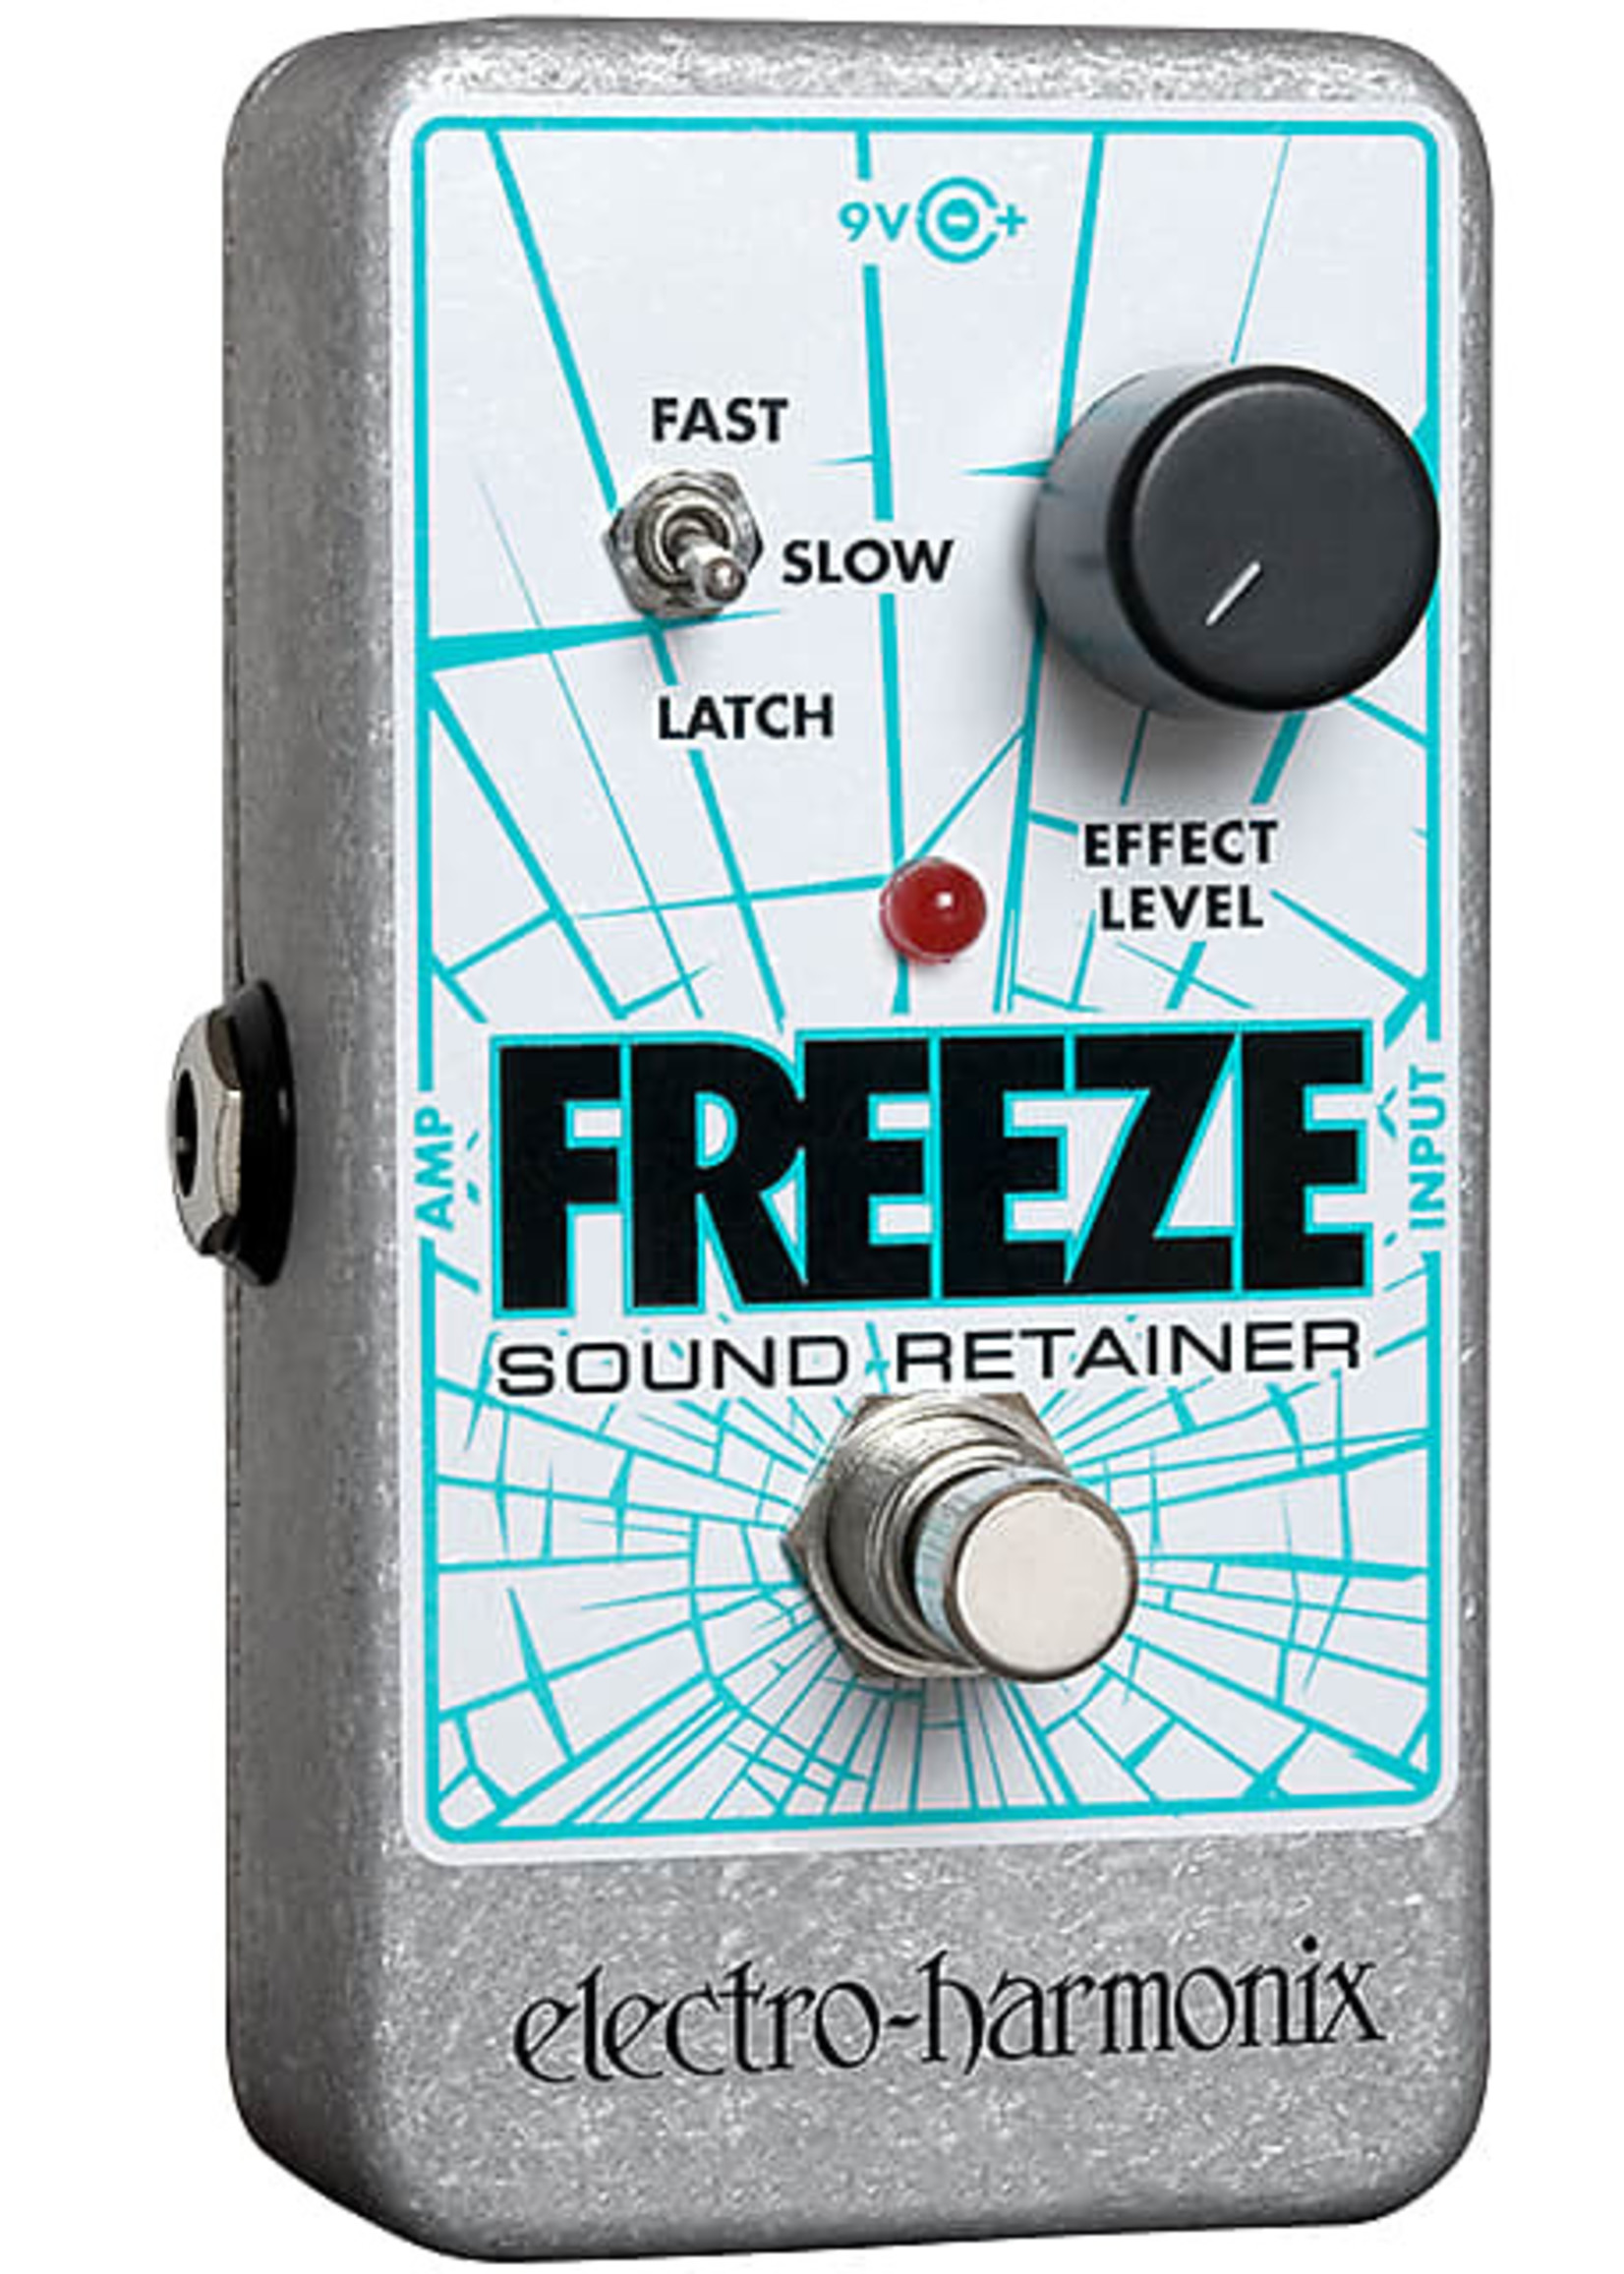 Electro-Harmonix Electro-Harmonix Freeze Sound Retainer Pedal